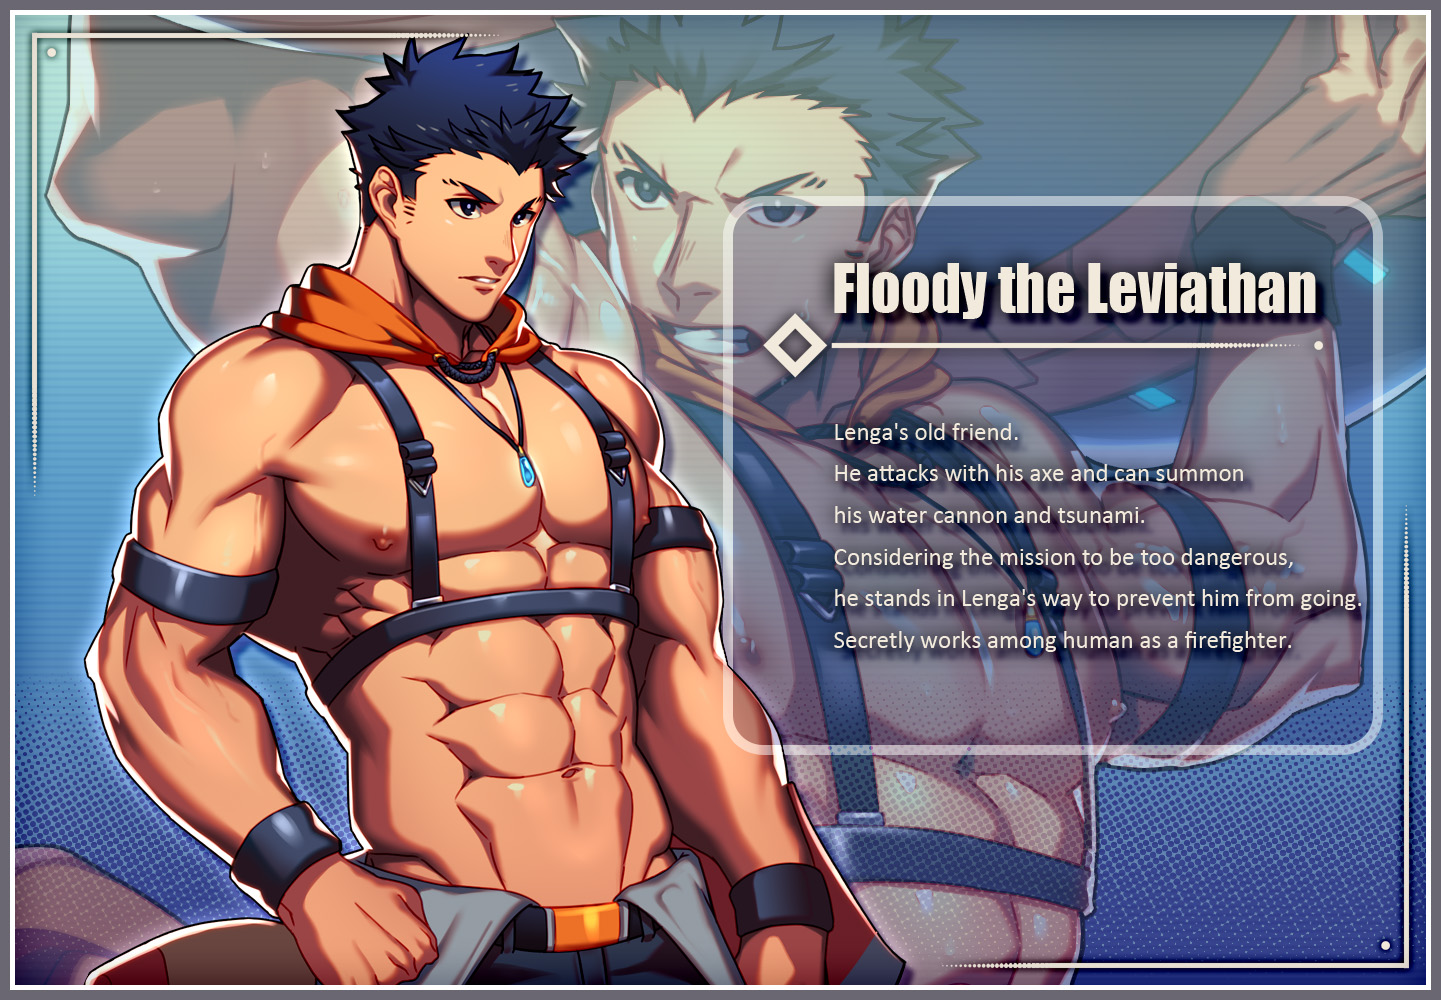 617120_Floody_The_Leviathan.jpg